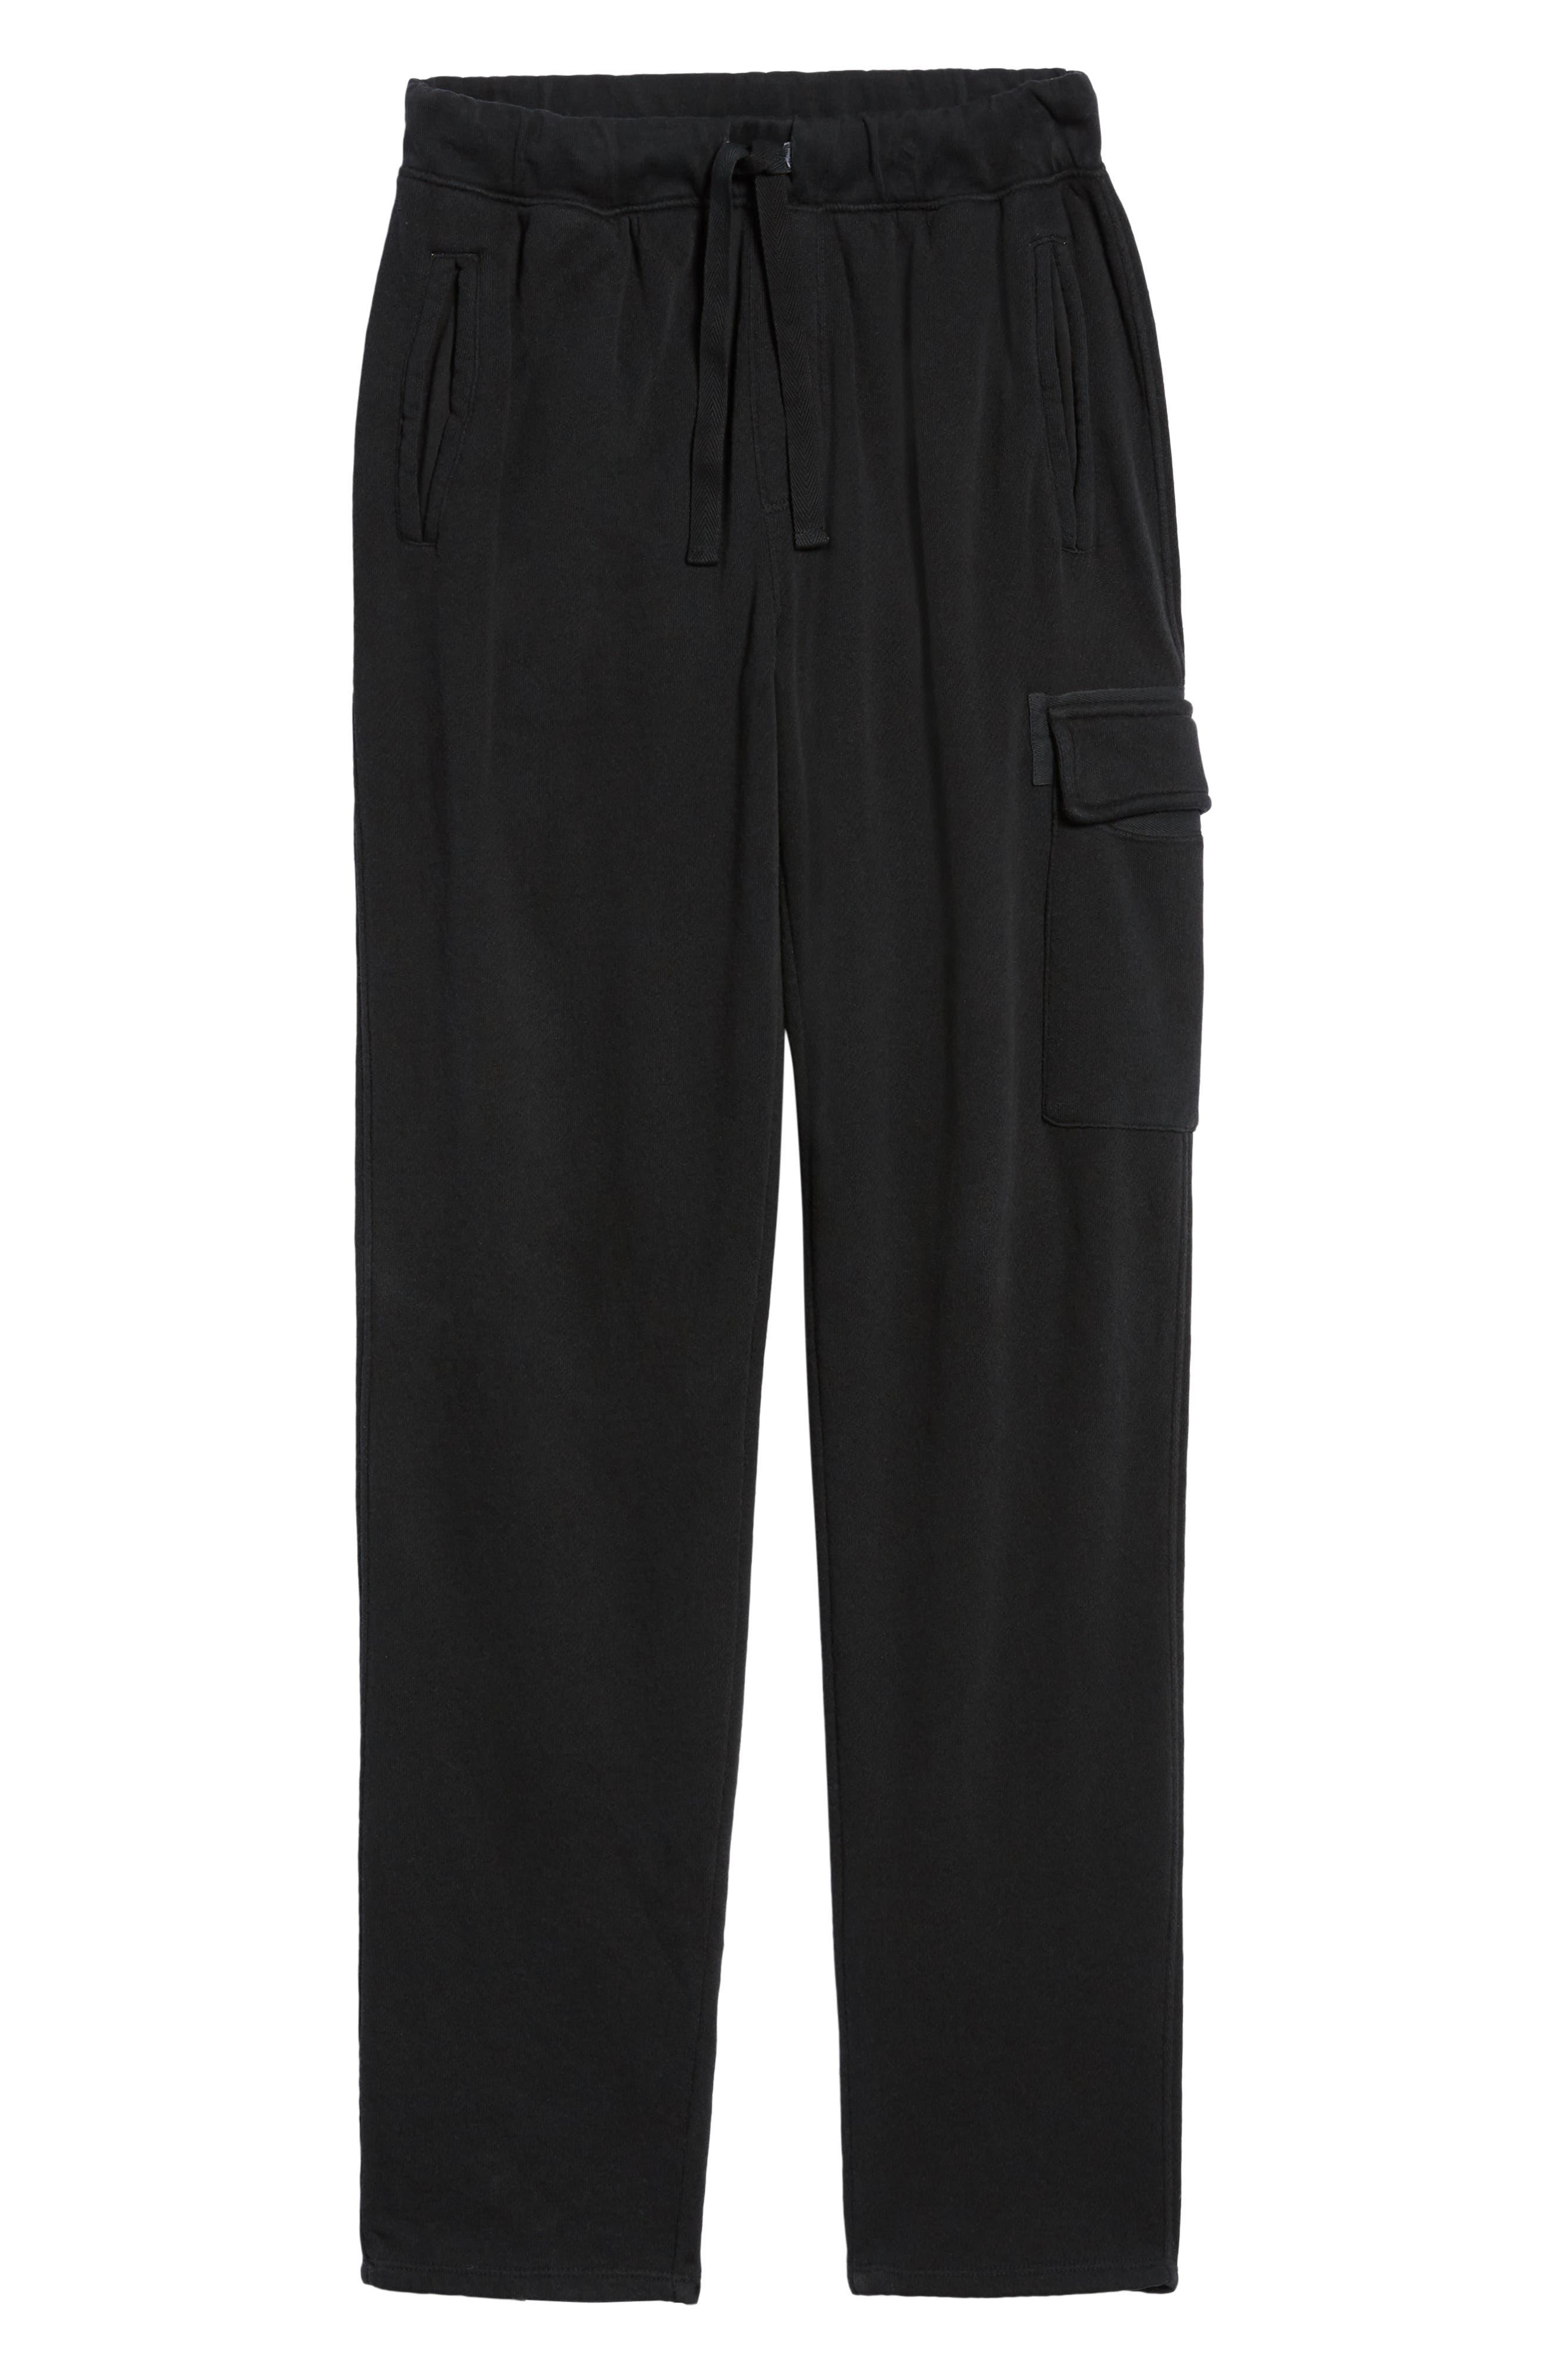 Slim Fit Sweatpants,                             Alternate thumbnail 6, color,                             CHARCOAL